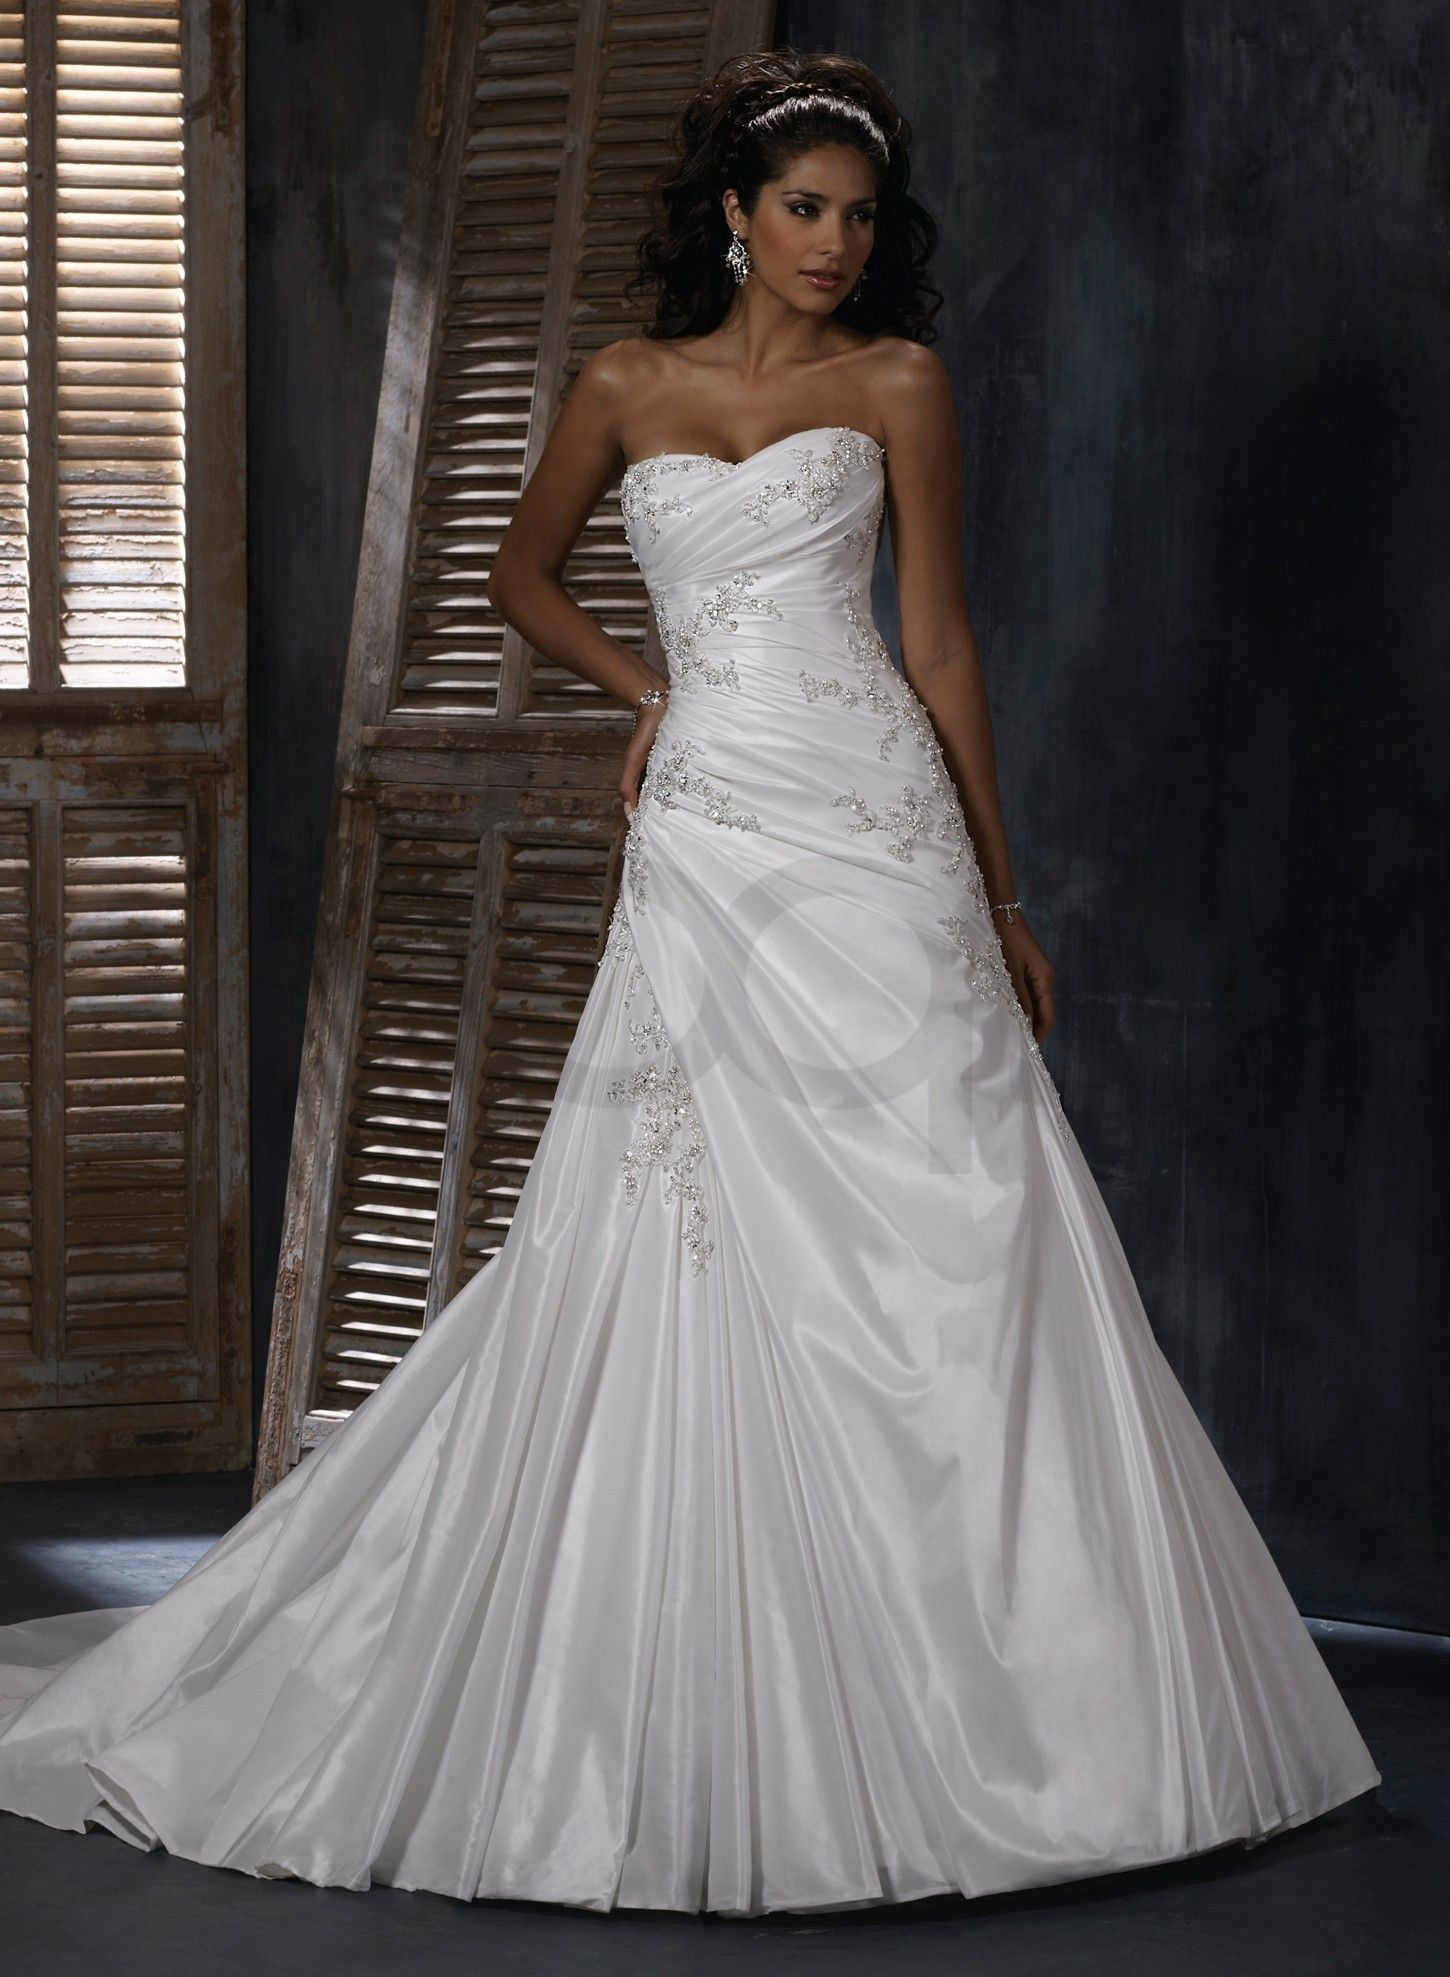 sweet heart wedding dresses Bordeaux Taffeta Soft